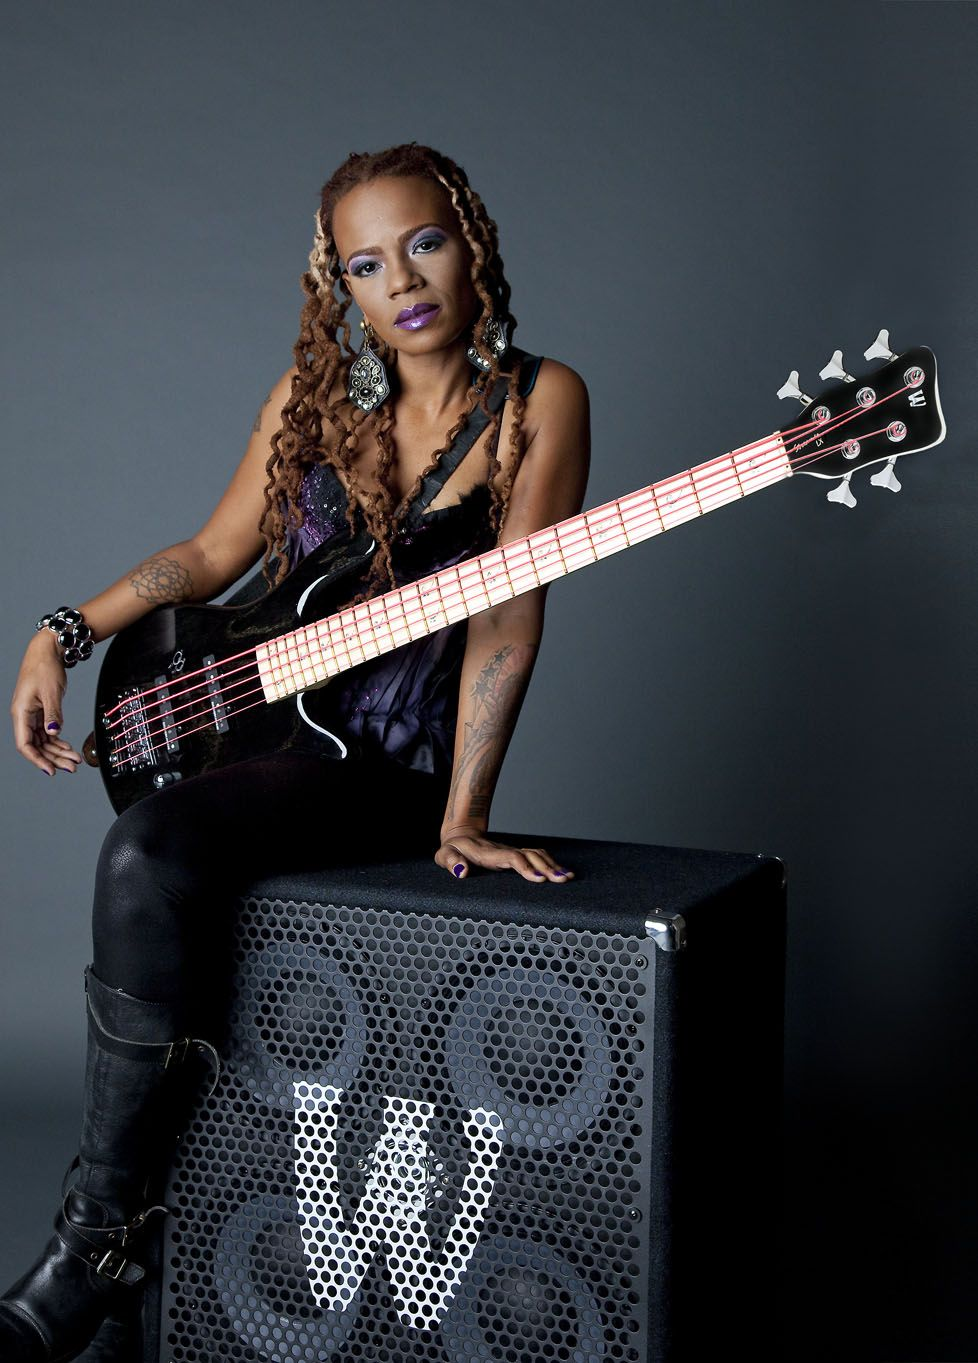 nude women with bass guitar